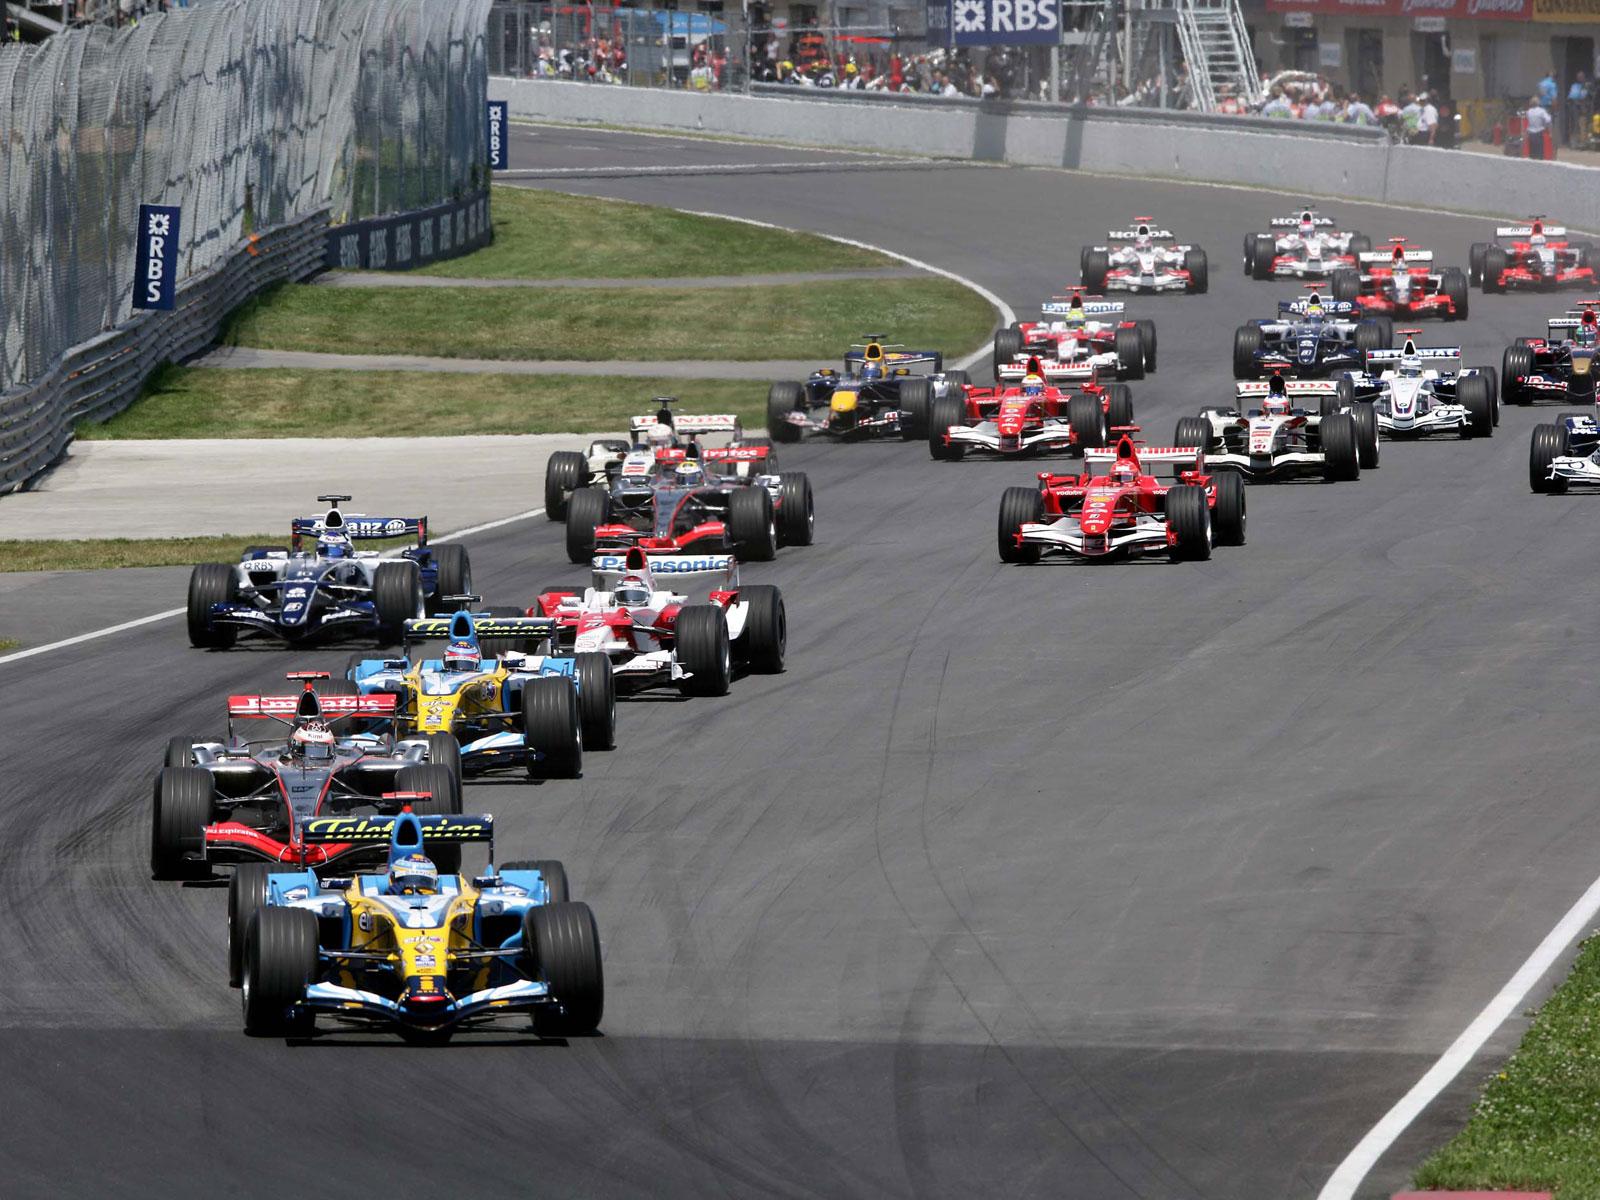 F1 2006